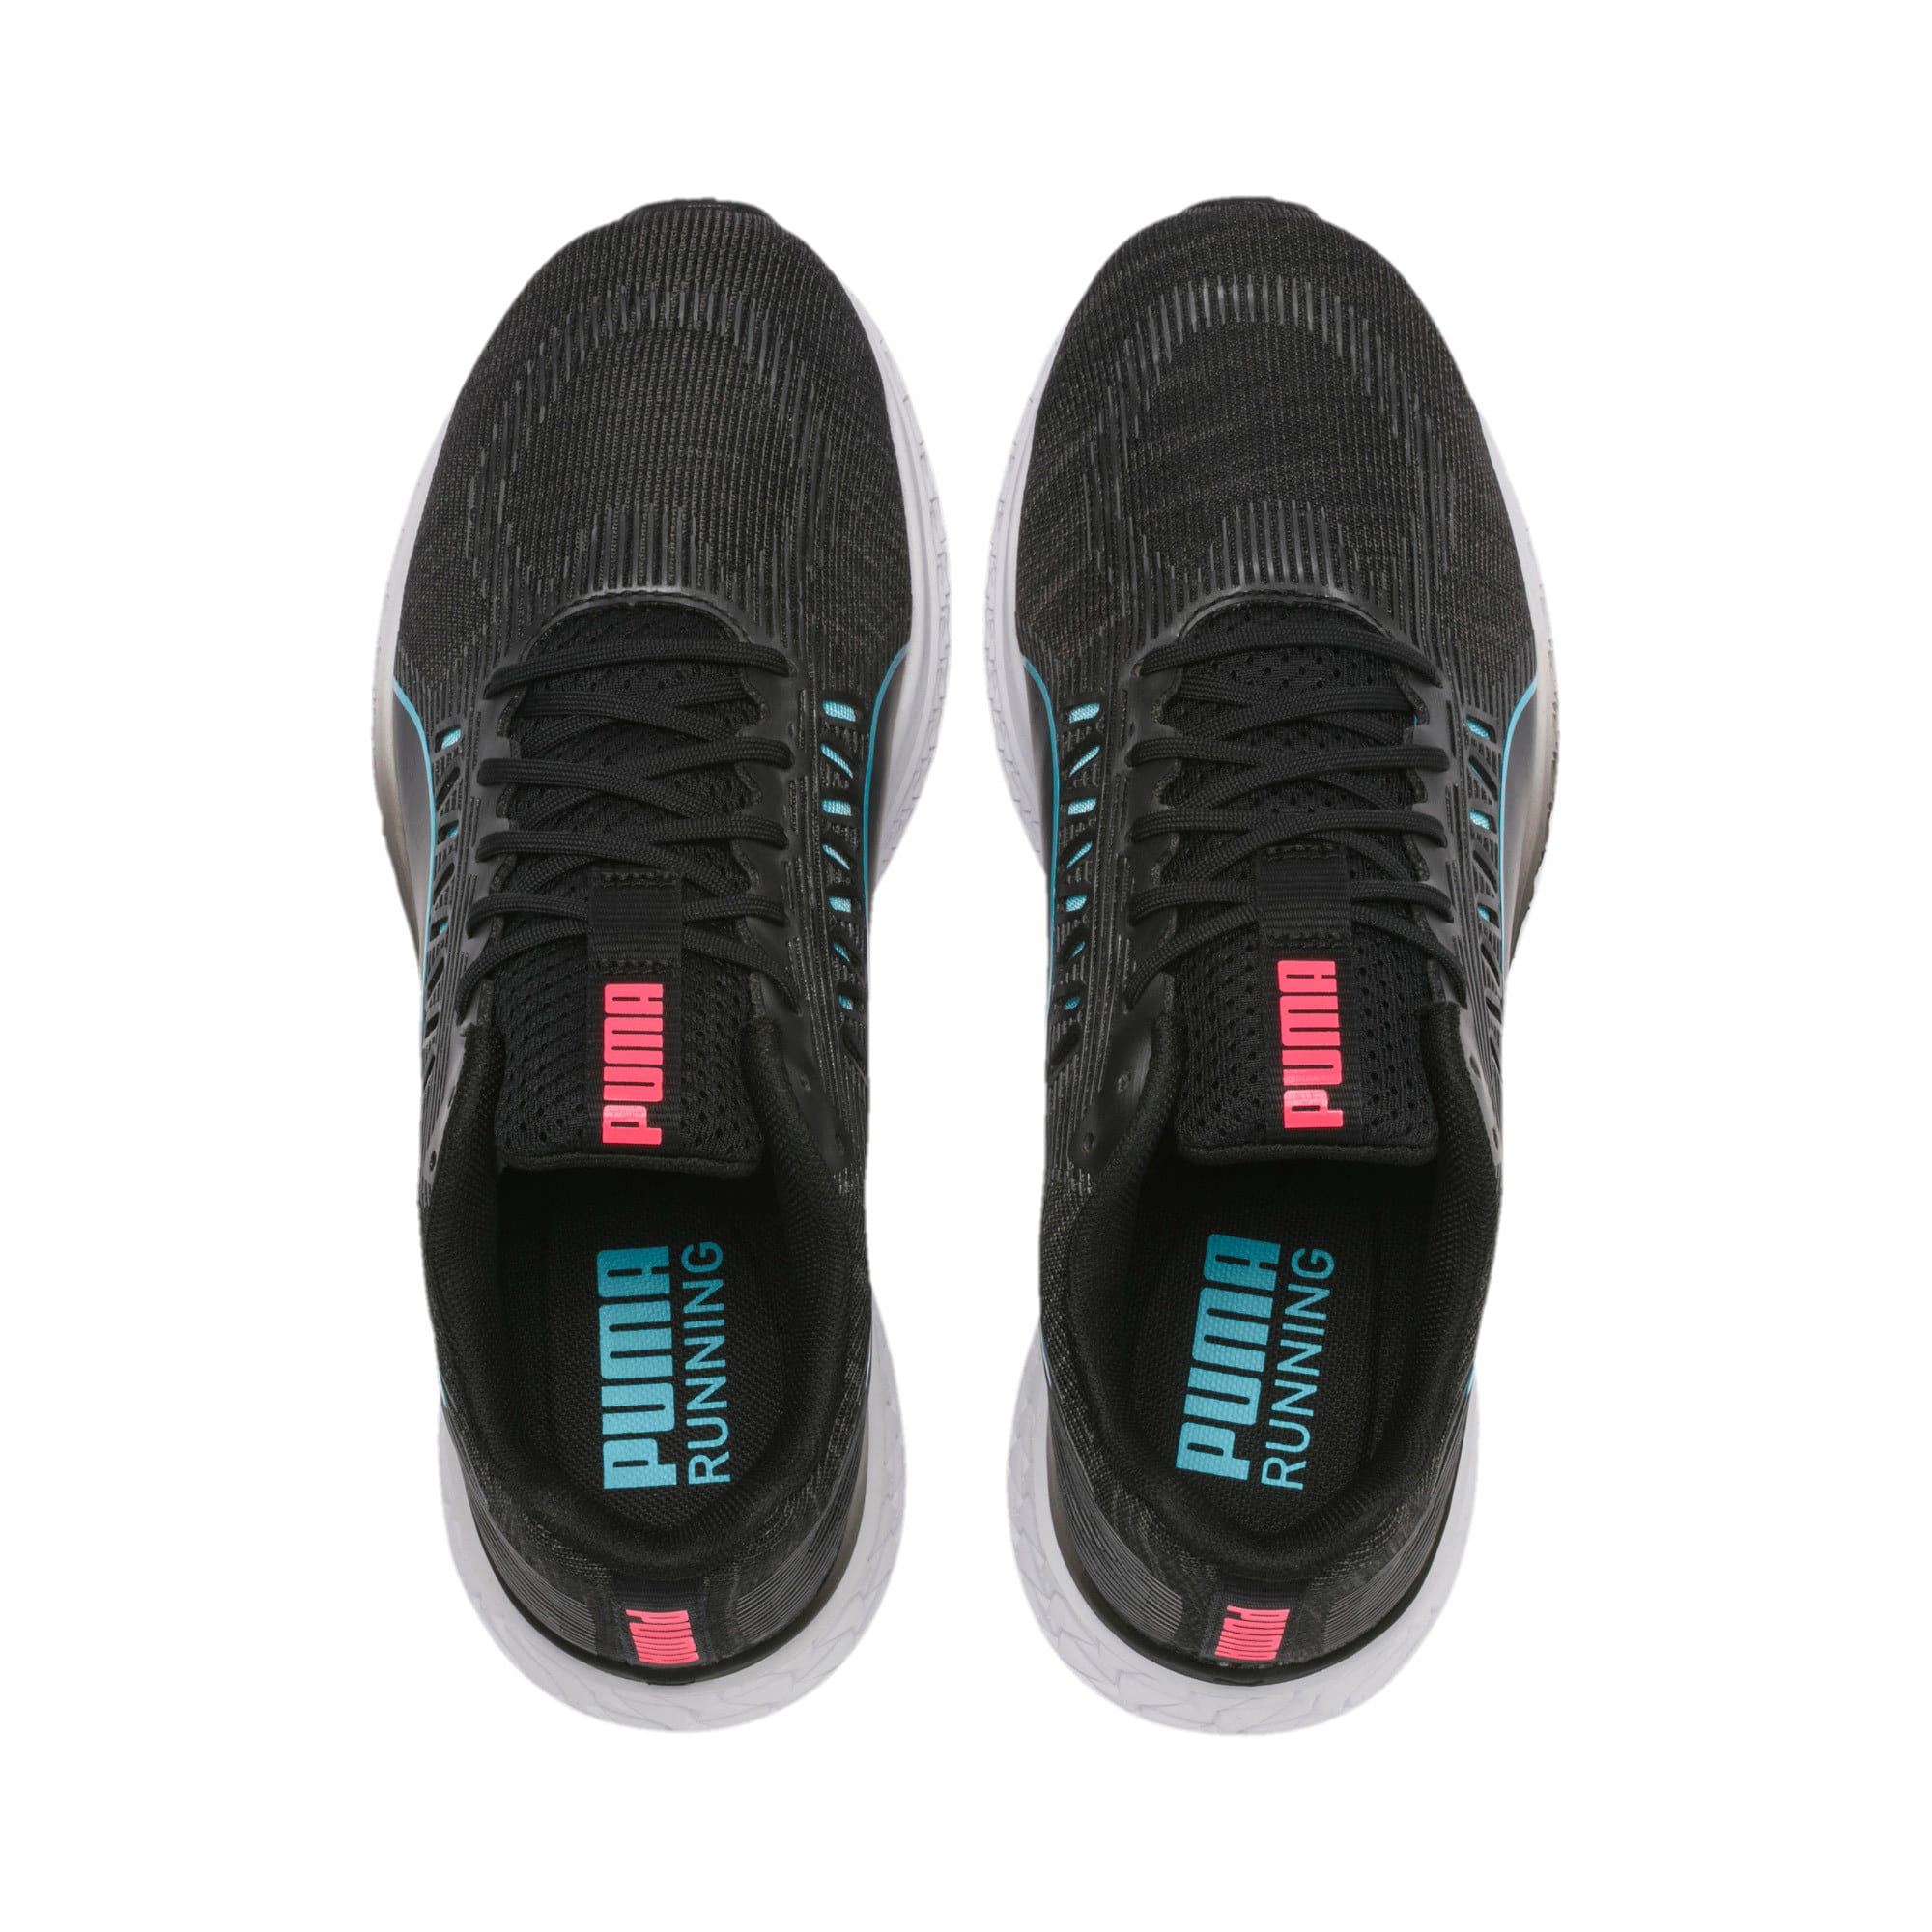 Thumbnail 8 of Speed Sutamina Women's Running Shoes, Black-Milky Blue-Pink Alert, medium